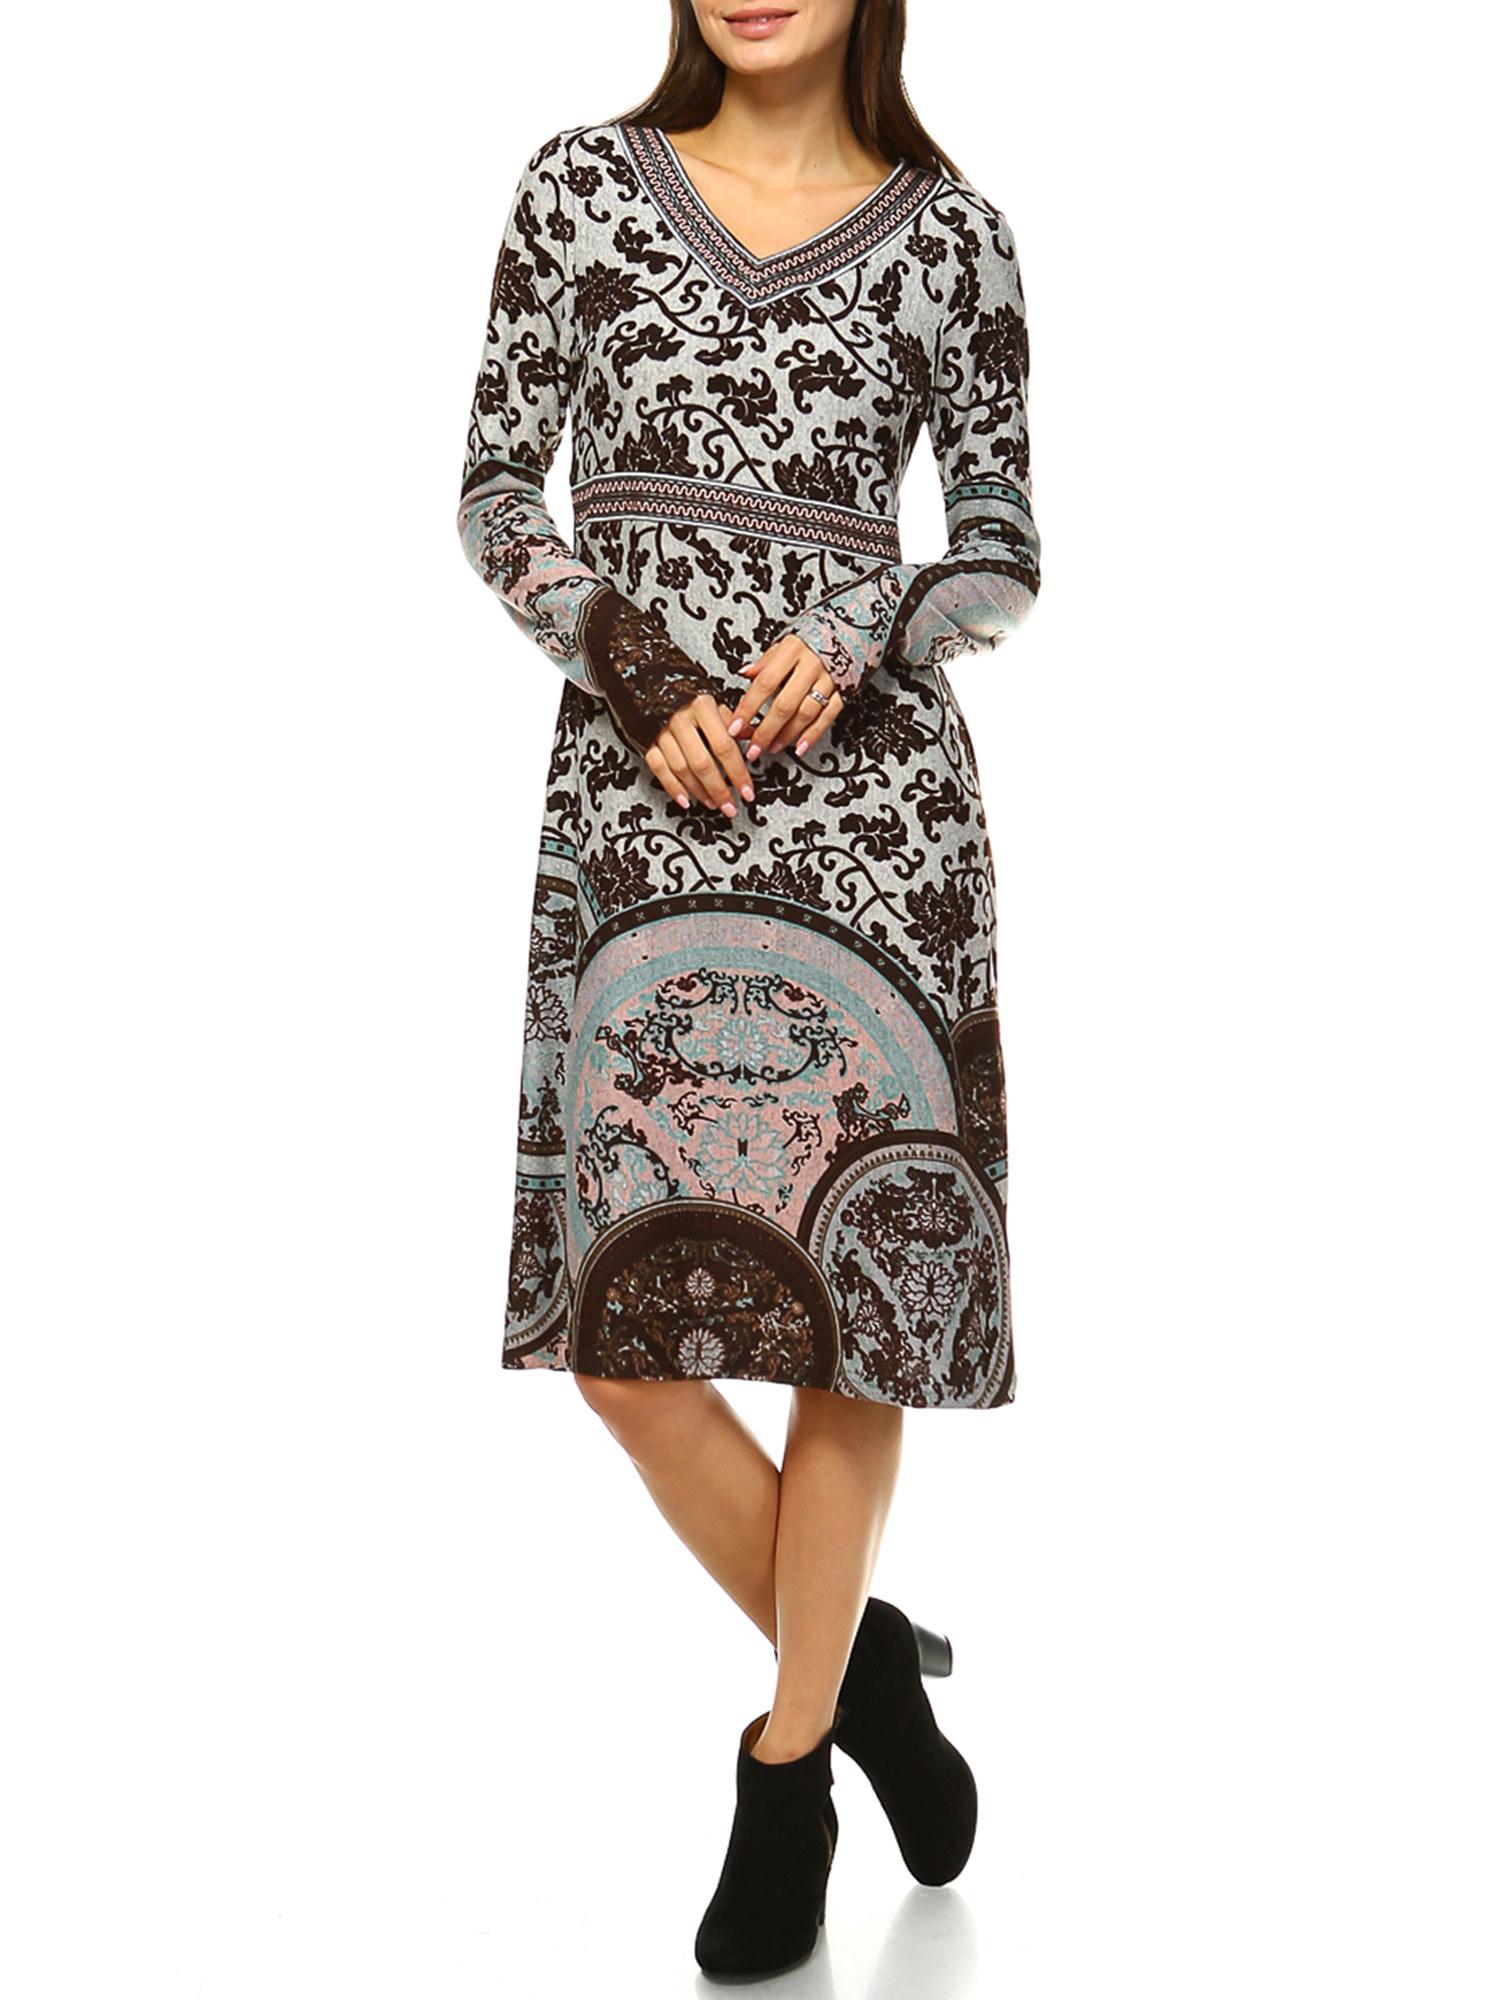 Model wears the floral patterned dress